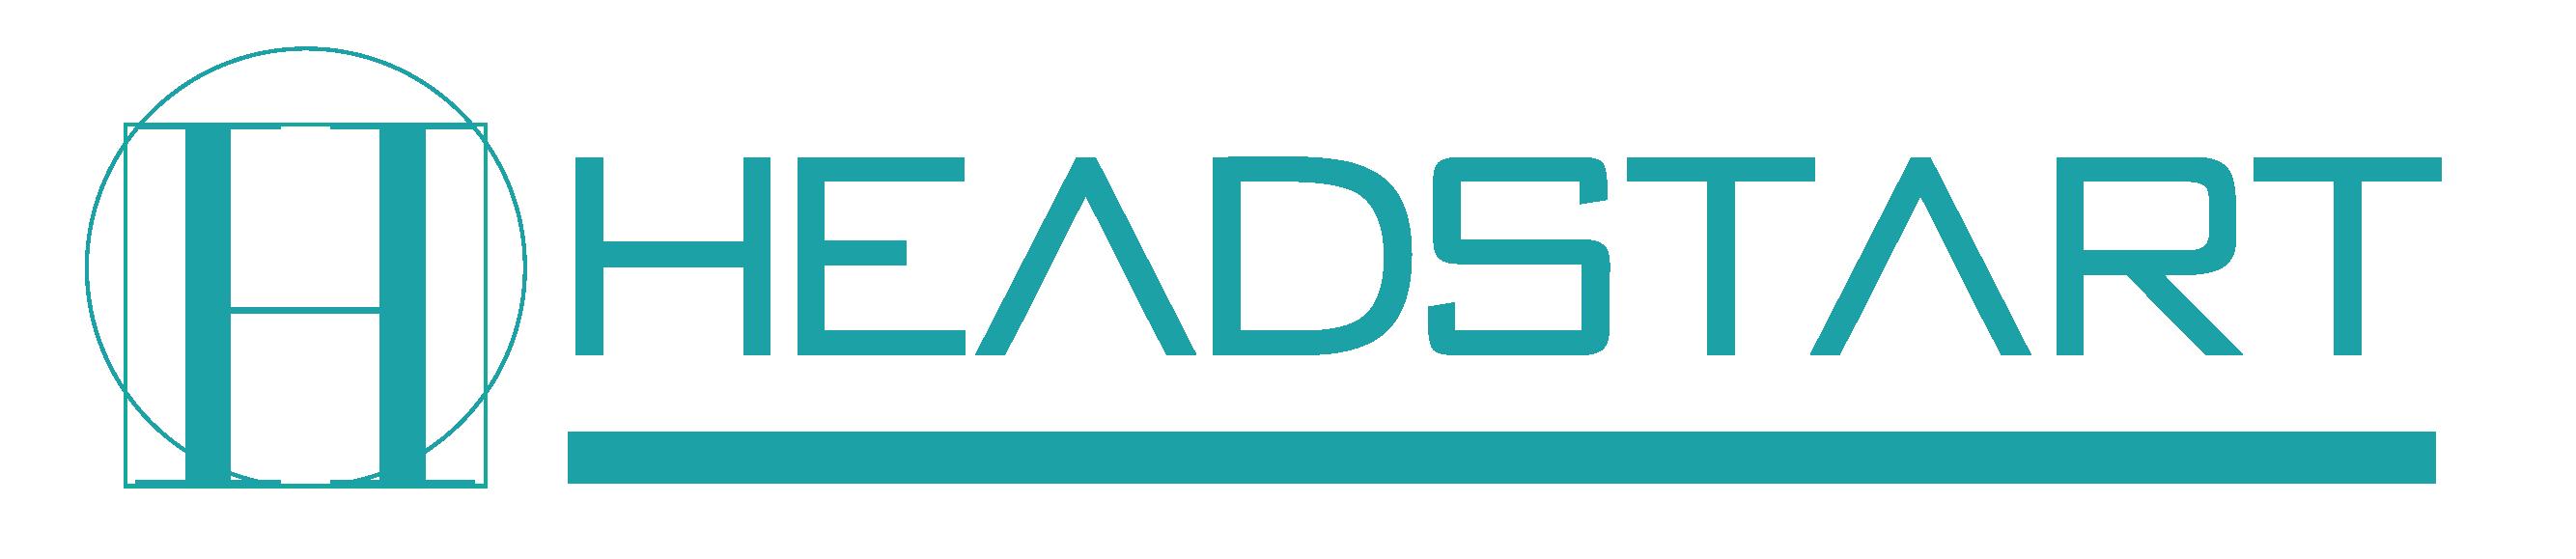 Headstart Technology Limited